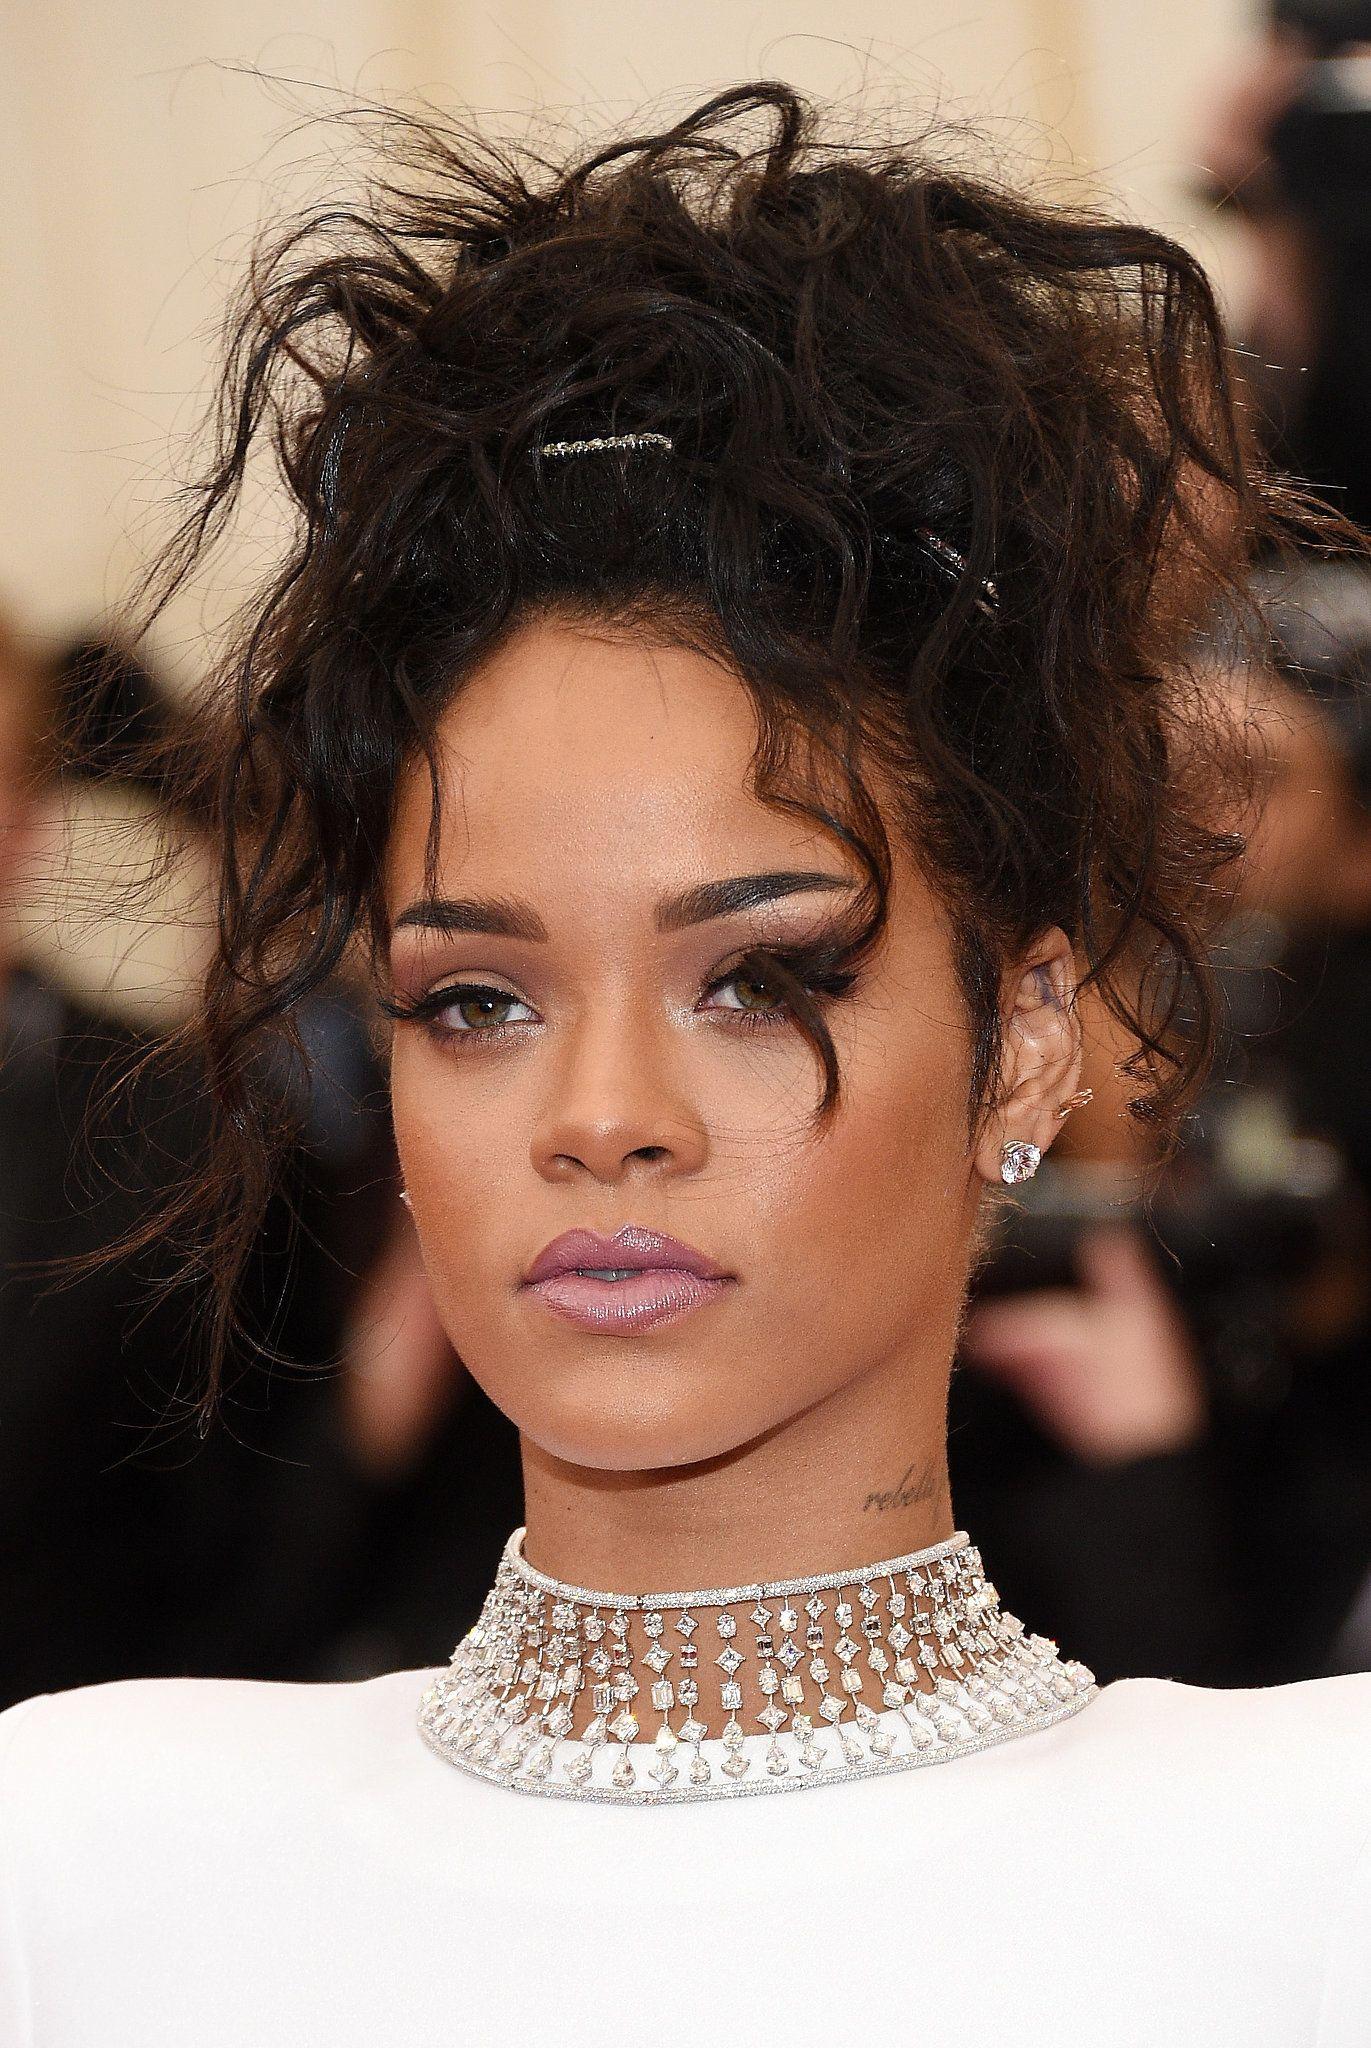 Gala met rihannas hair makeup forecast to wear for summer in 2019